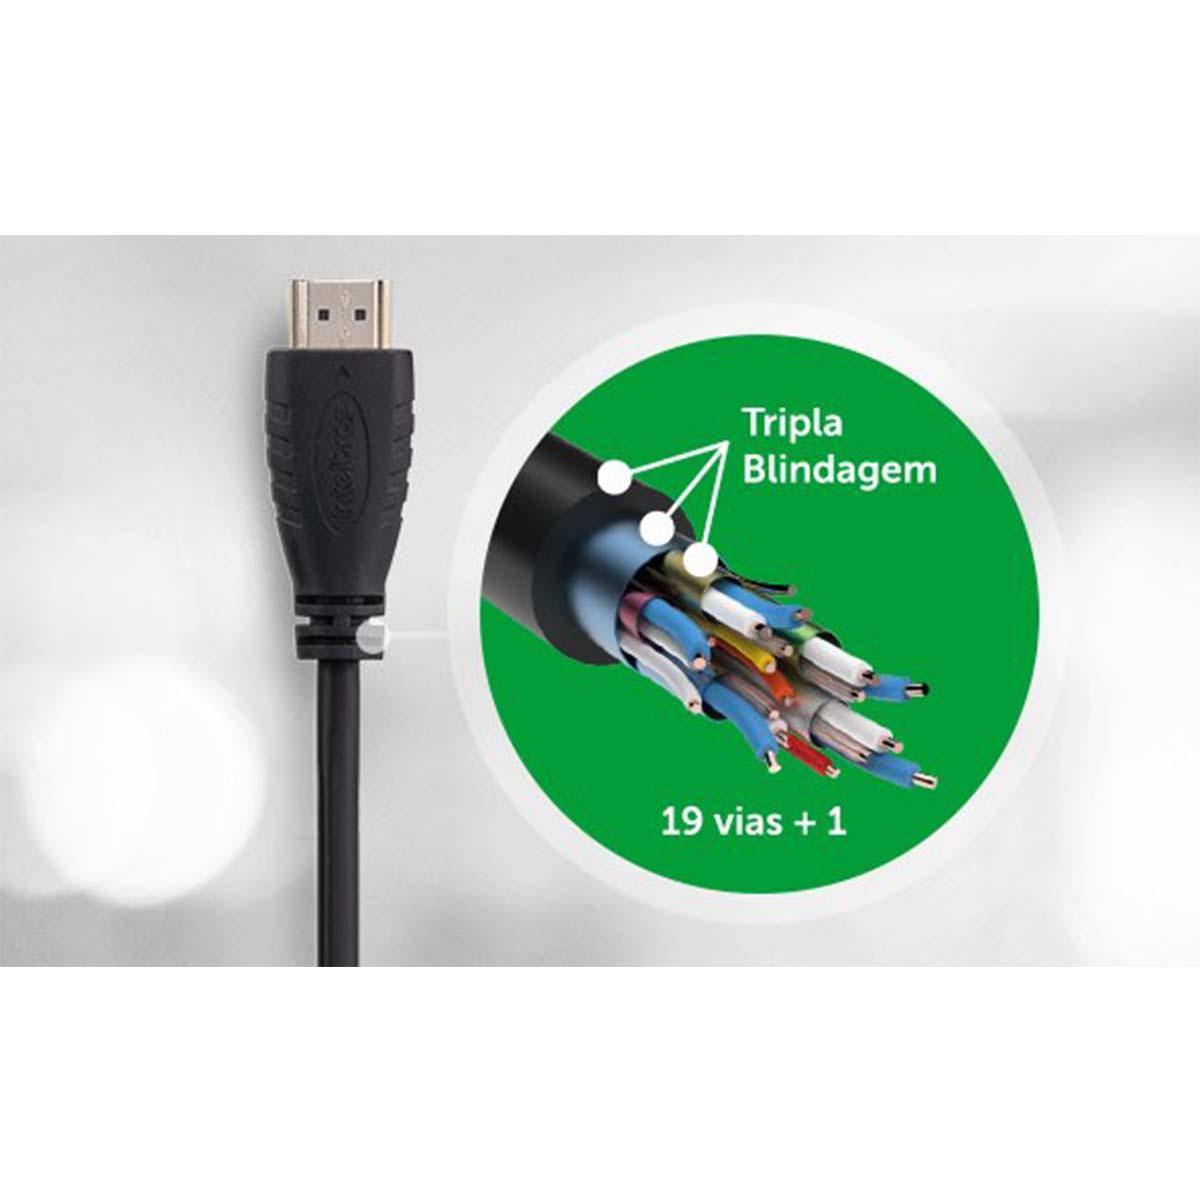 CABO HDMI INTELBRAS 2.0 3M CH 2030